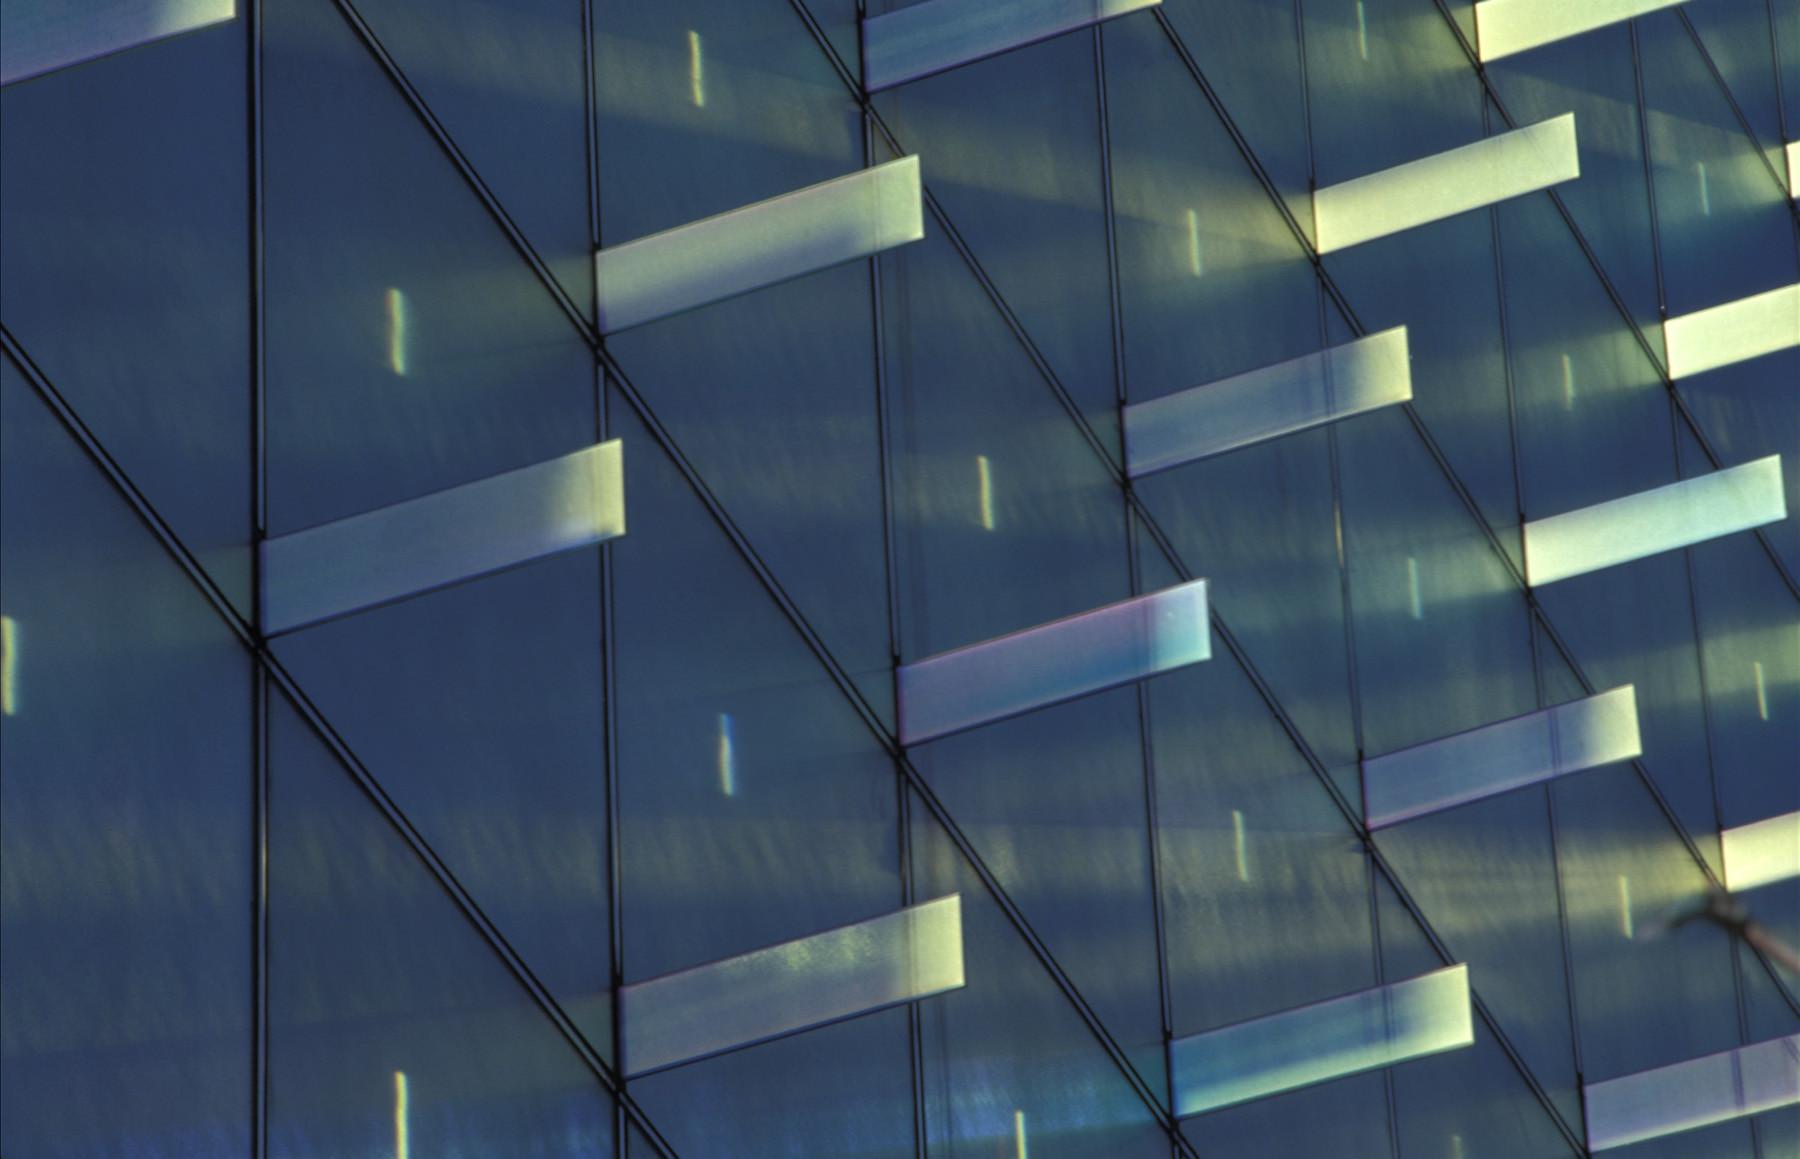 Light Matters Glass Beyond Transparency With James Math Wallpaper Golden Find Free HD for Desktop [pastnedes.tk]